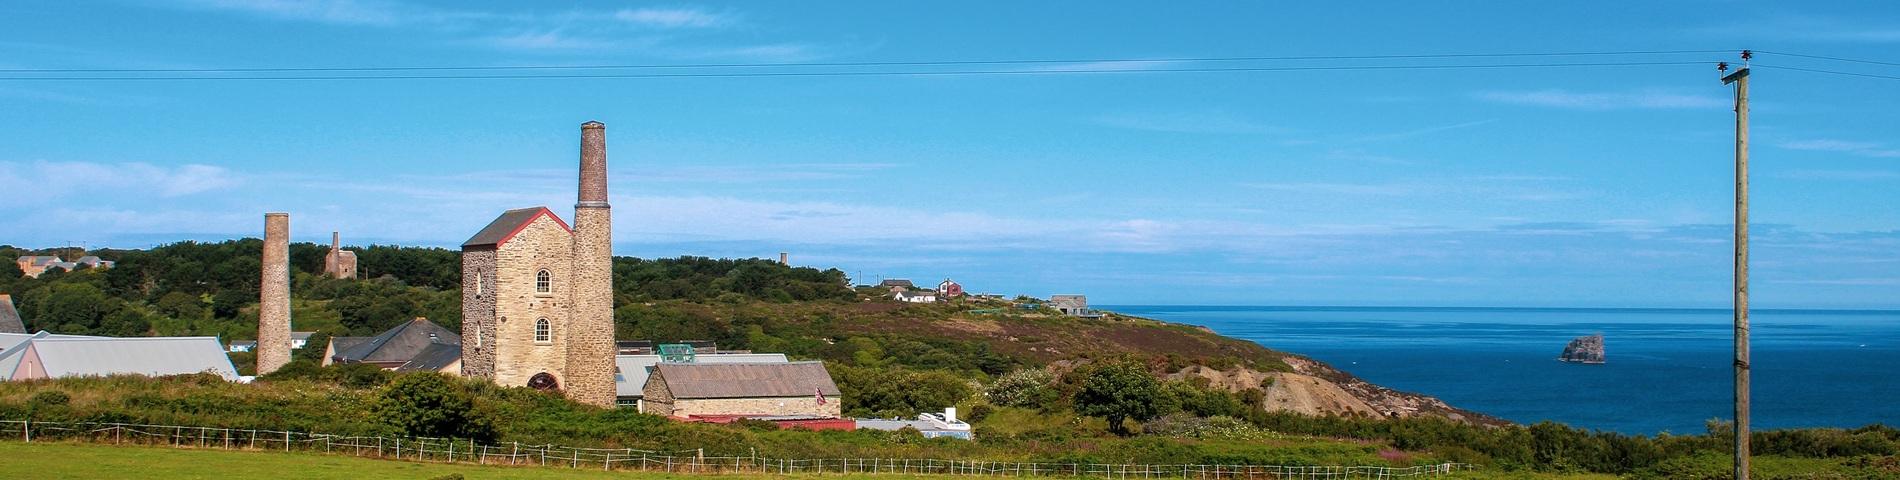 Skool Cornwall picture 1